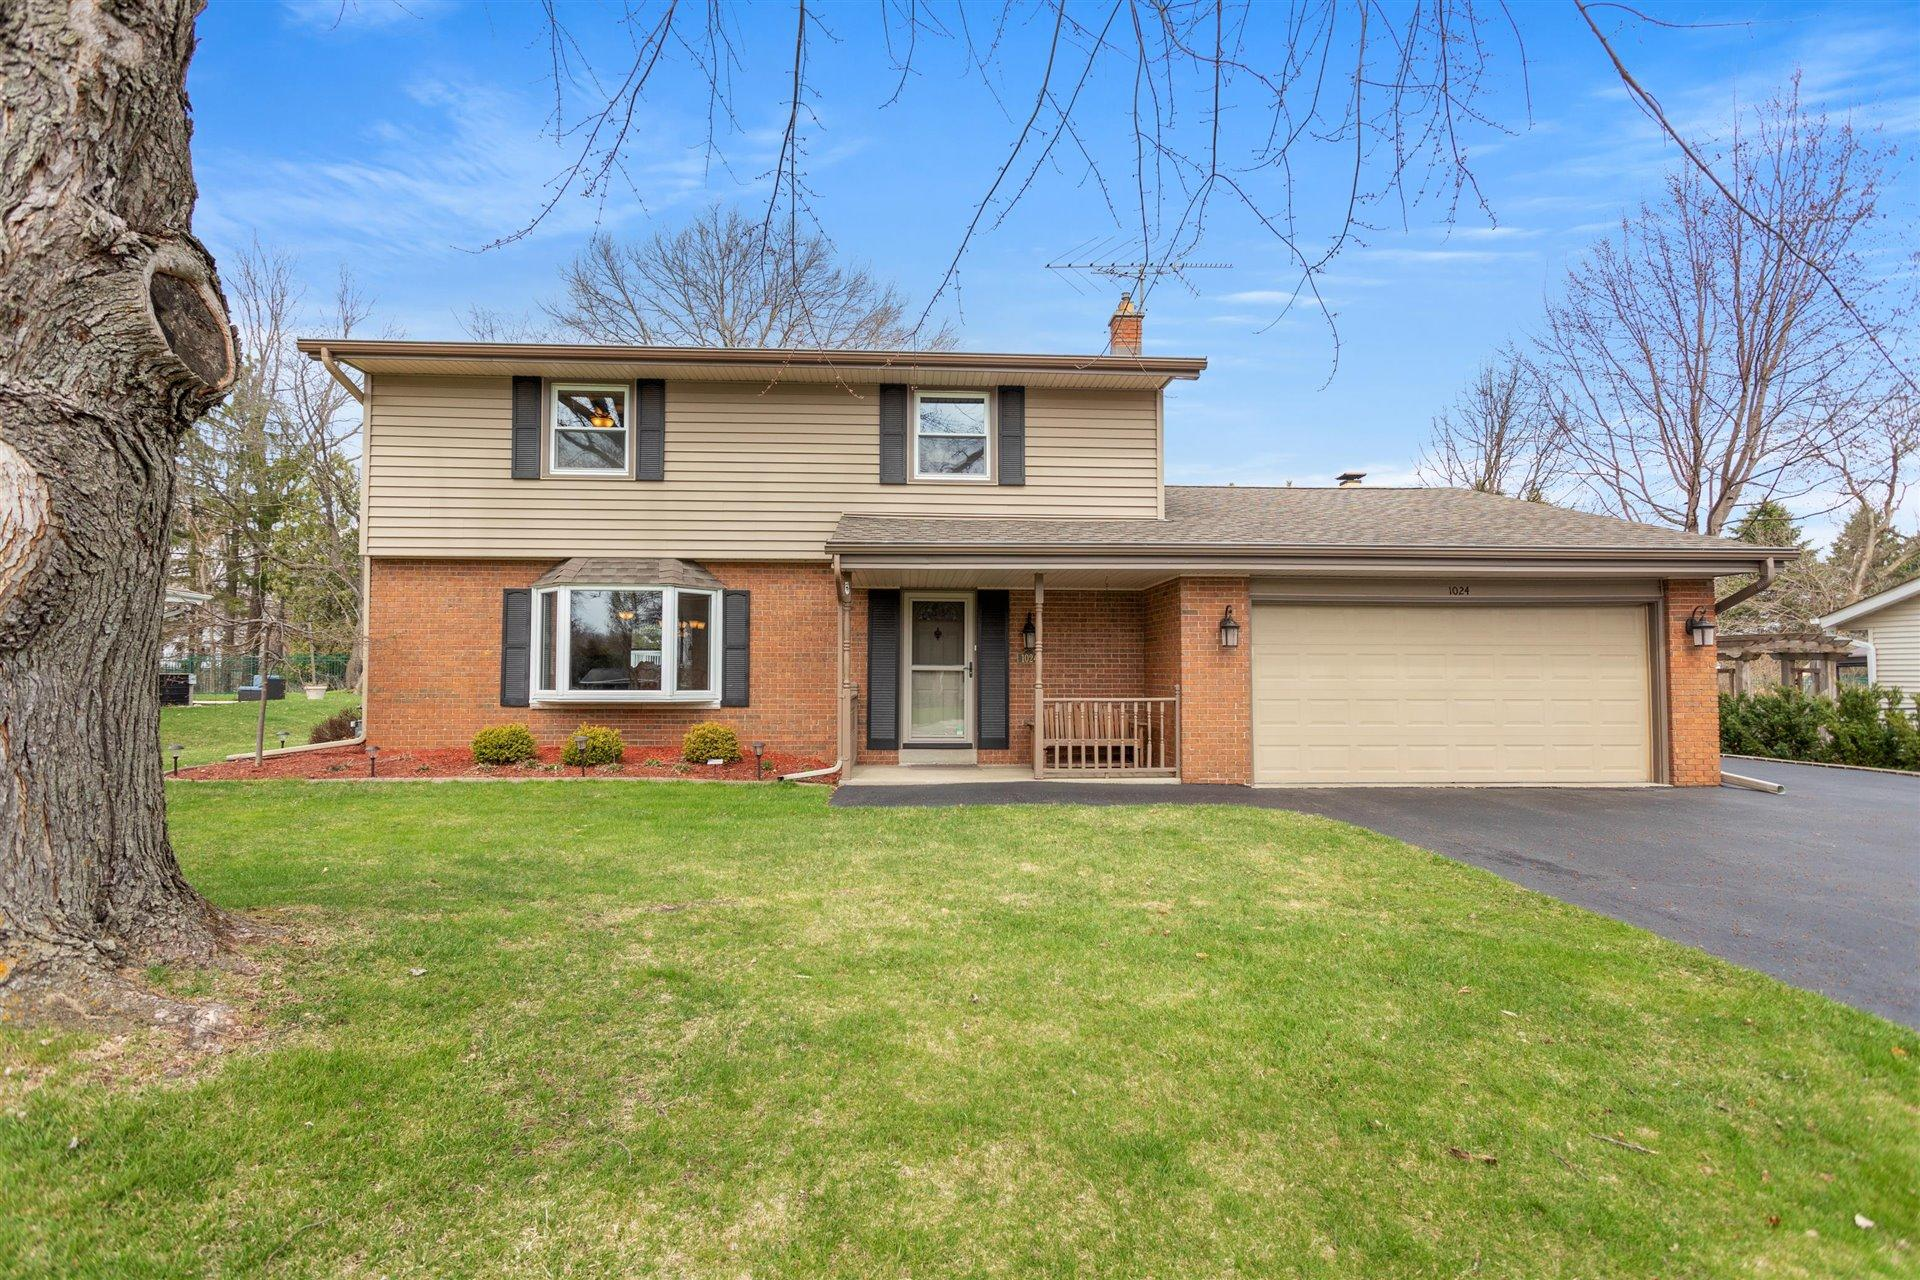 1024 Anton Rd, Hartland, Wisconsin 53029, 4 Bedrooms Bedrooms, 9 Rooms Rooms,2 BathroomsBathrooms,Single-Family,For Sale,Anton Rd,1733860